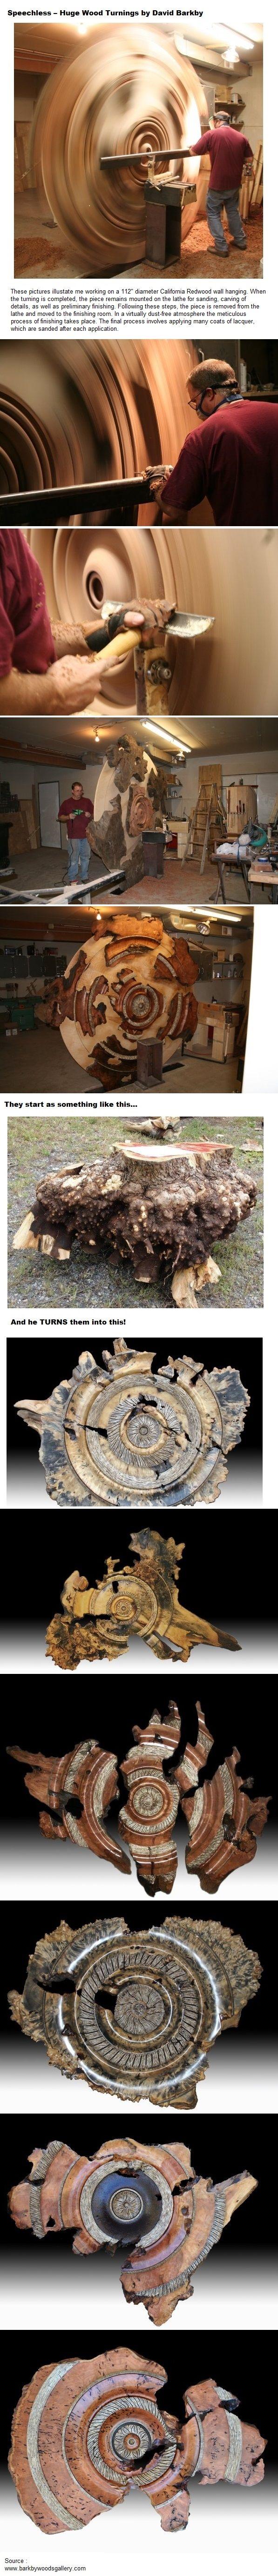 Speechless ..Huge Wood Turnings by David Barkby